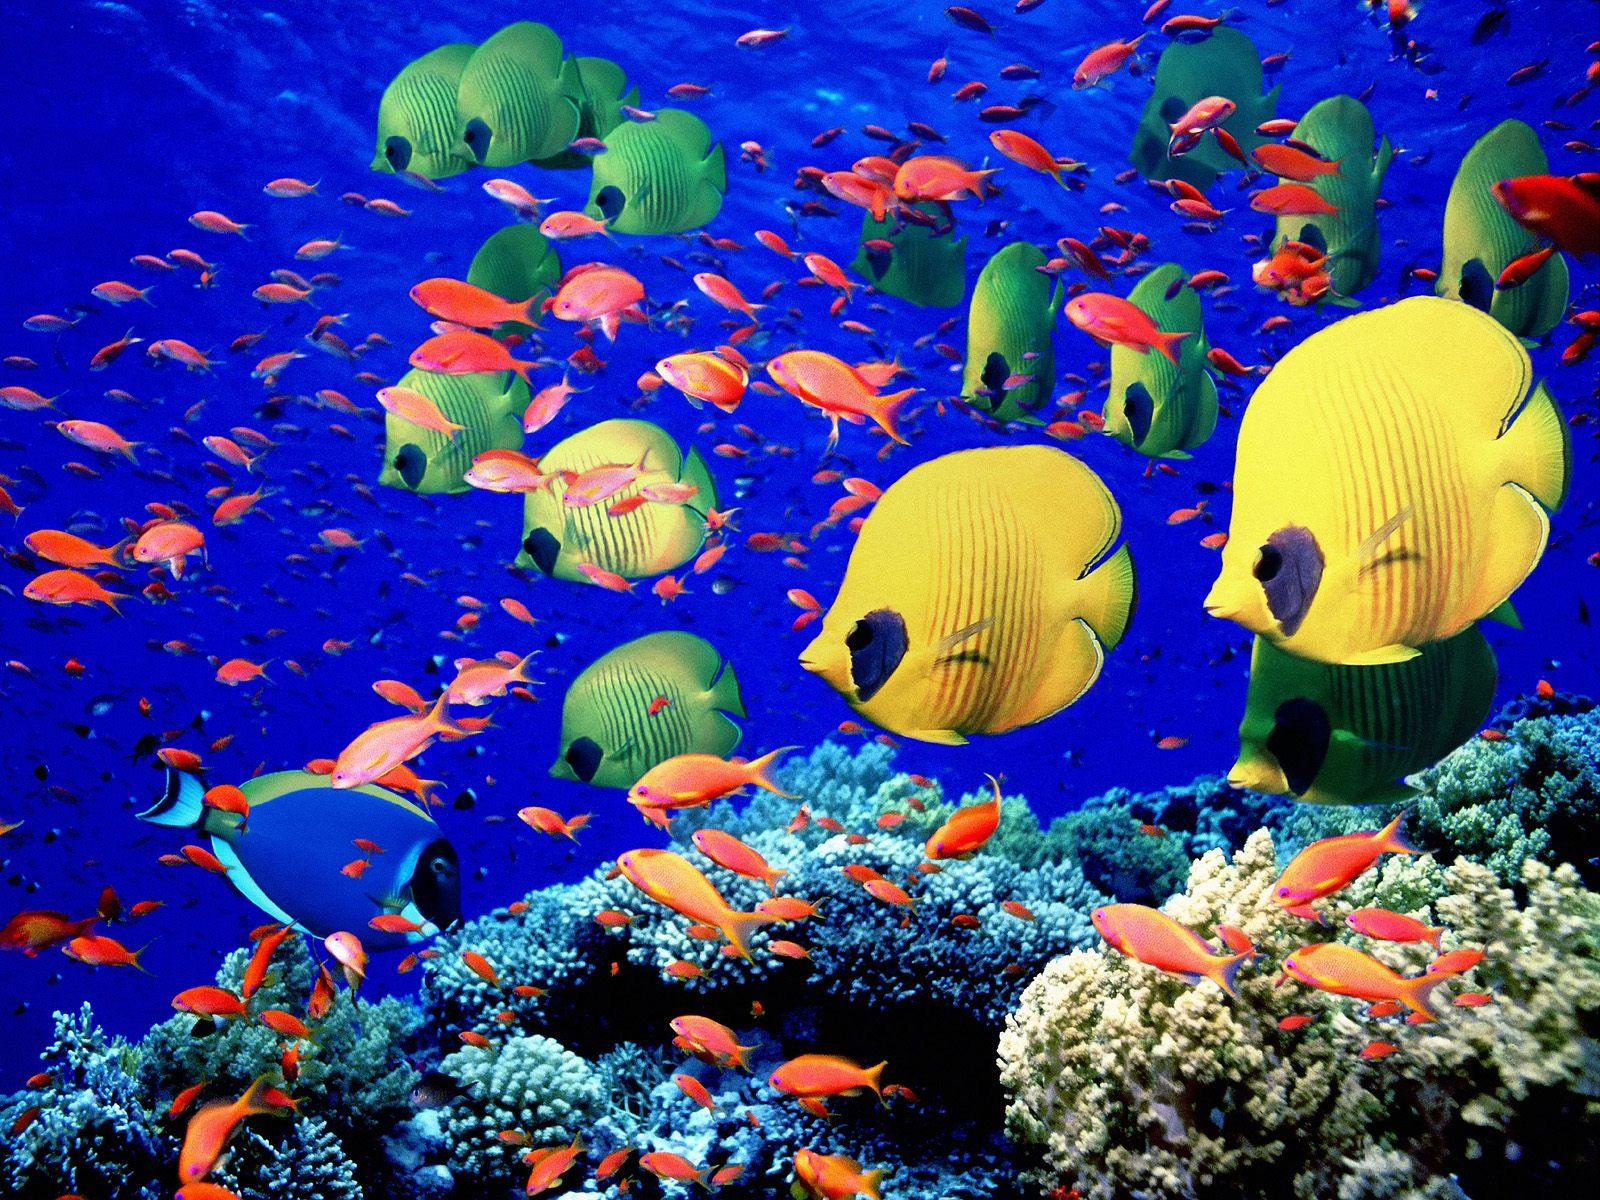 The Red-Sea underwater photos